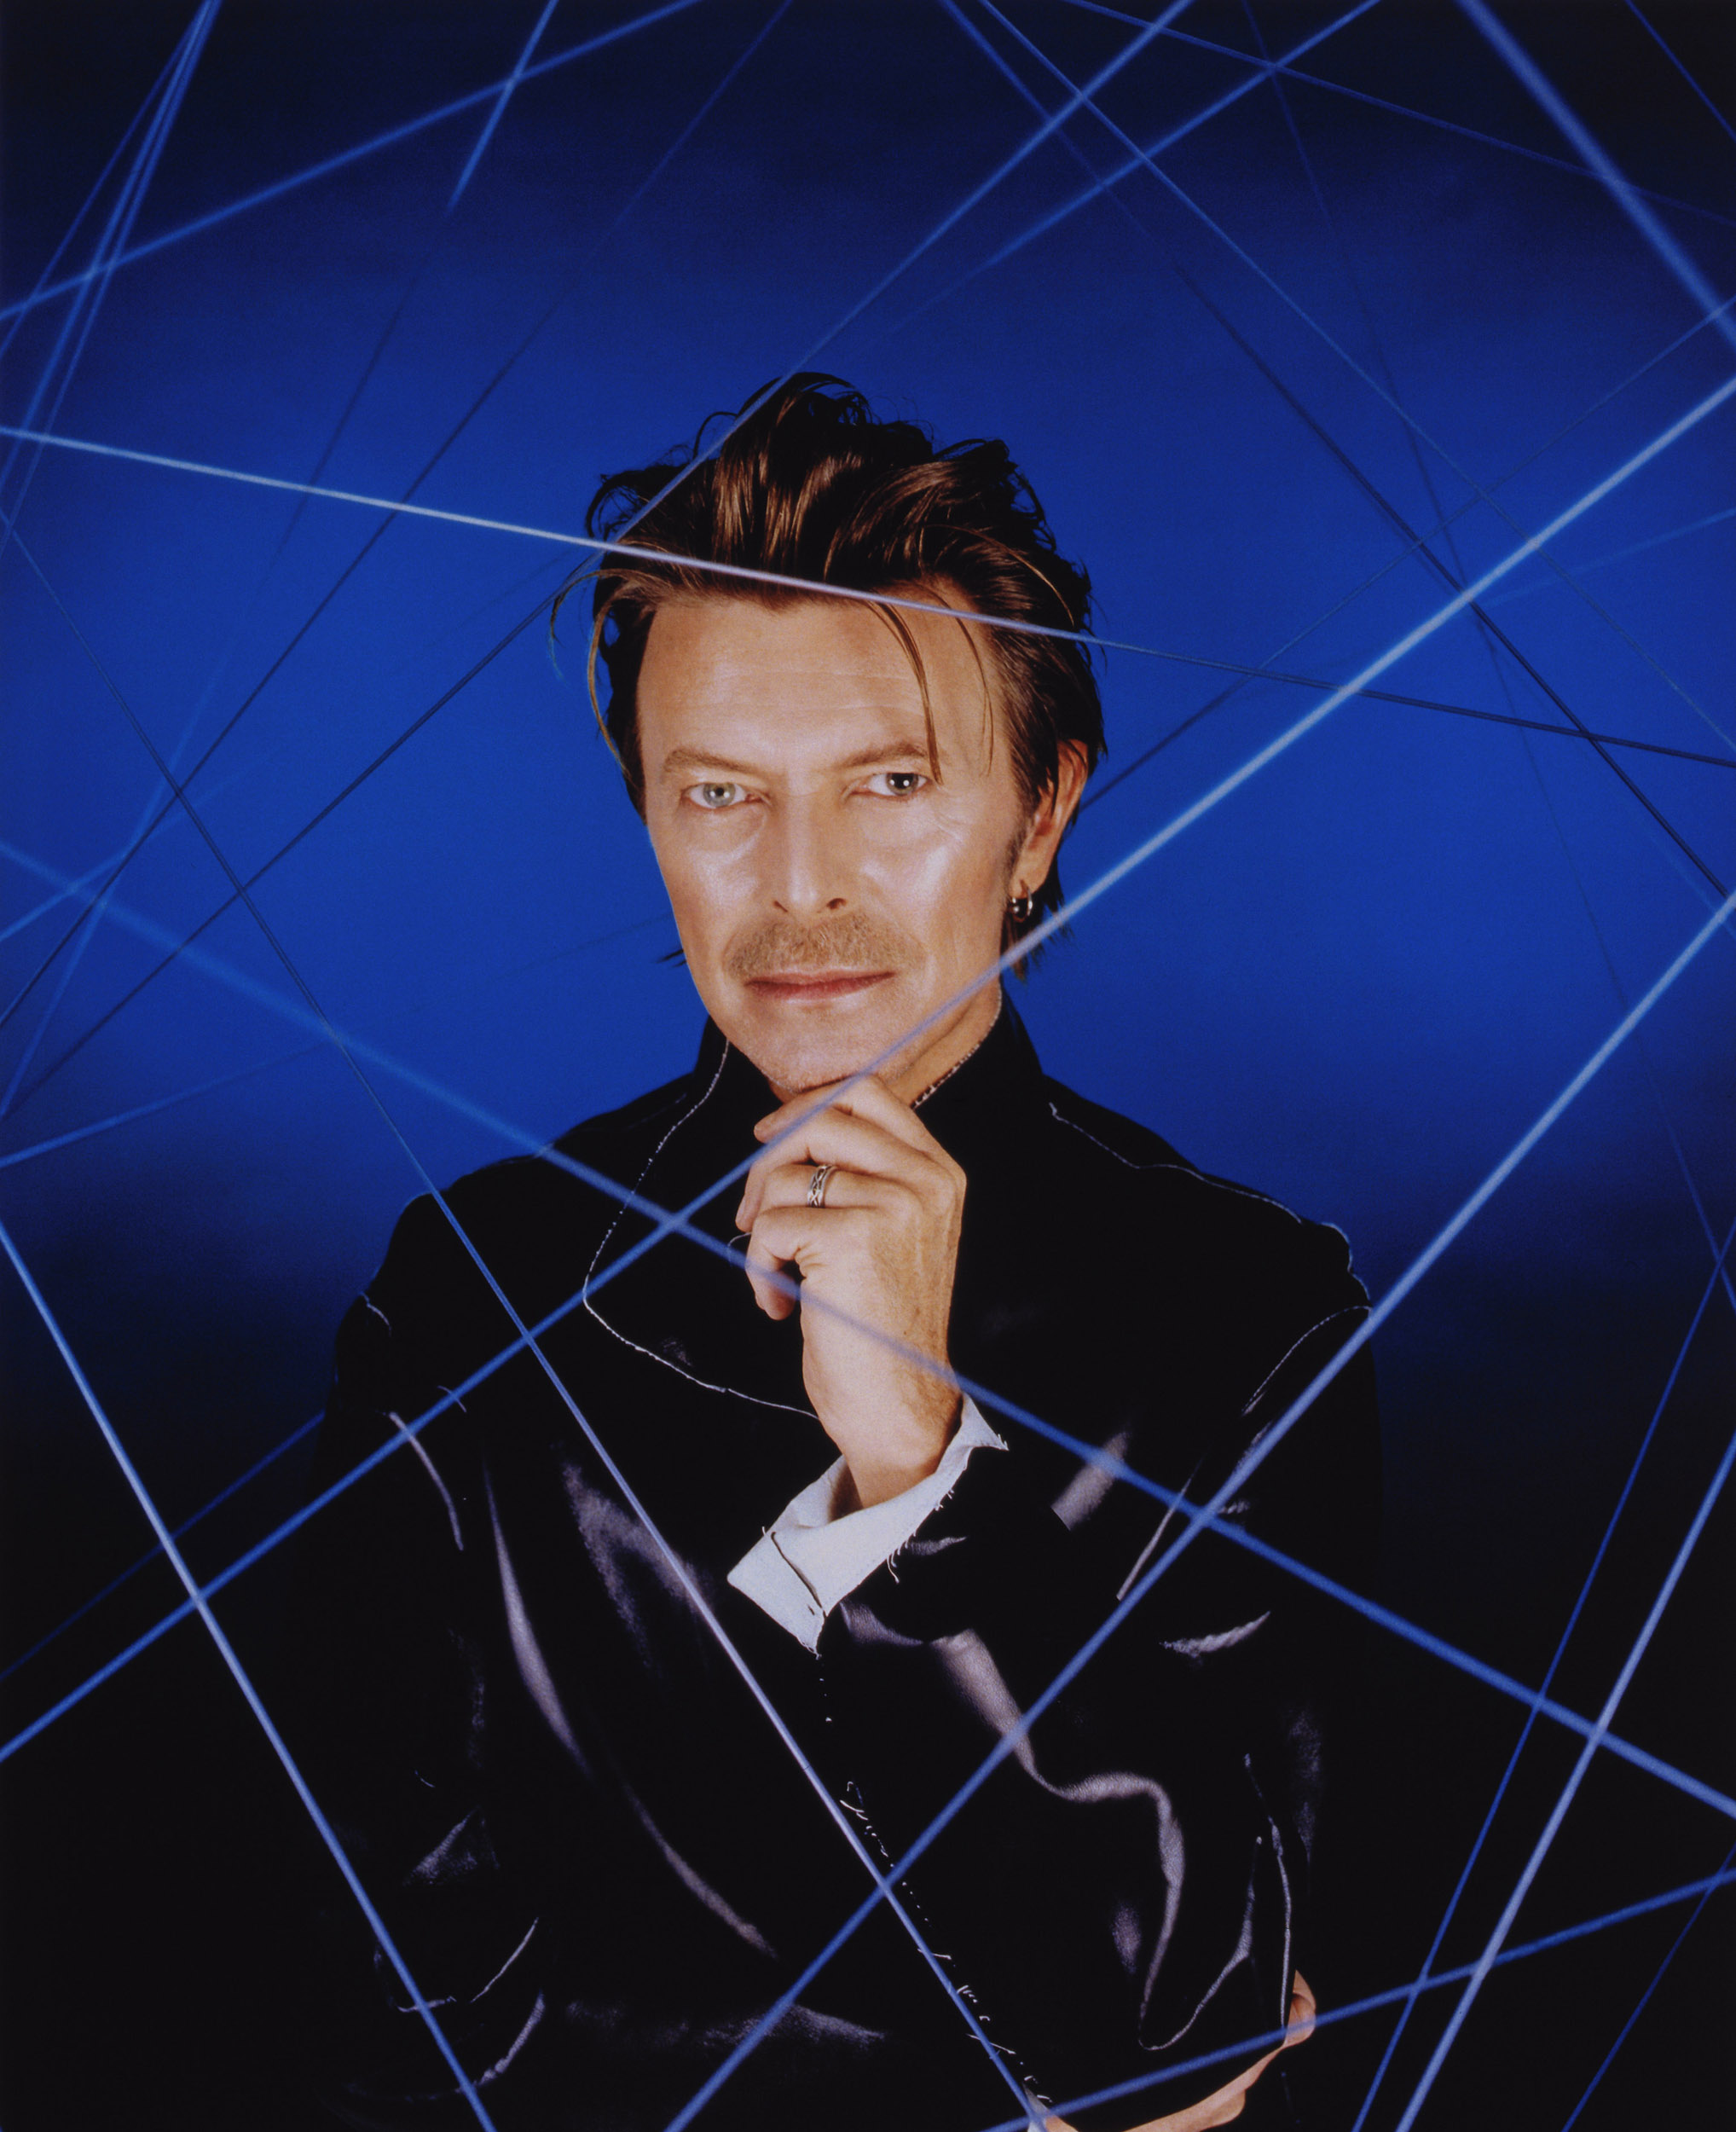 David Bowie photo 80 of 87 pics, wallpaper - photo #372021 ...